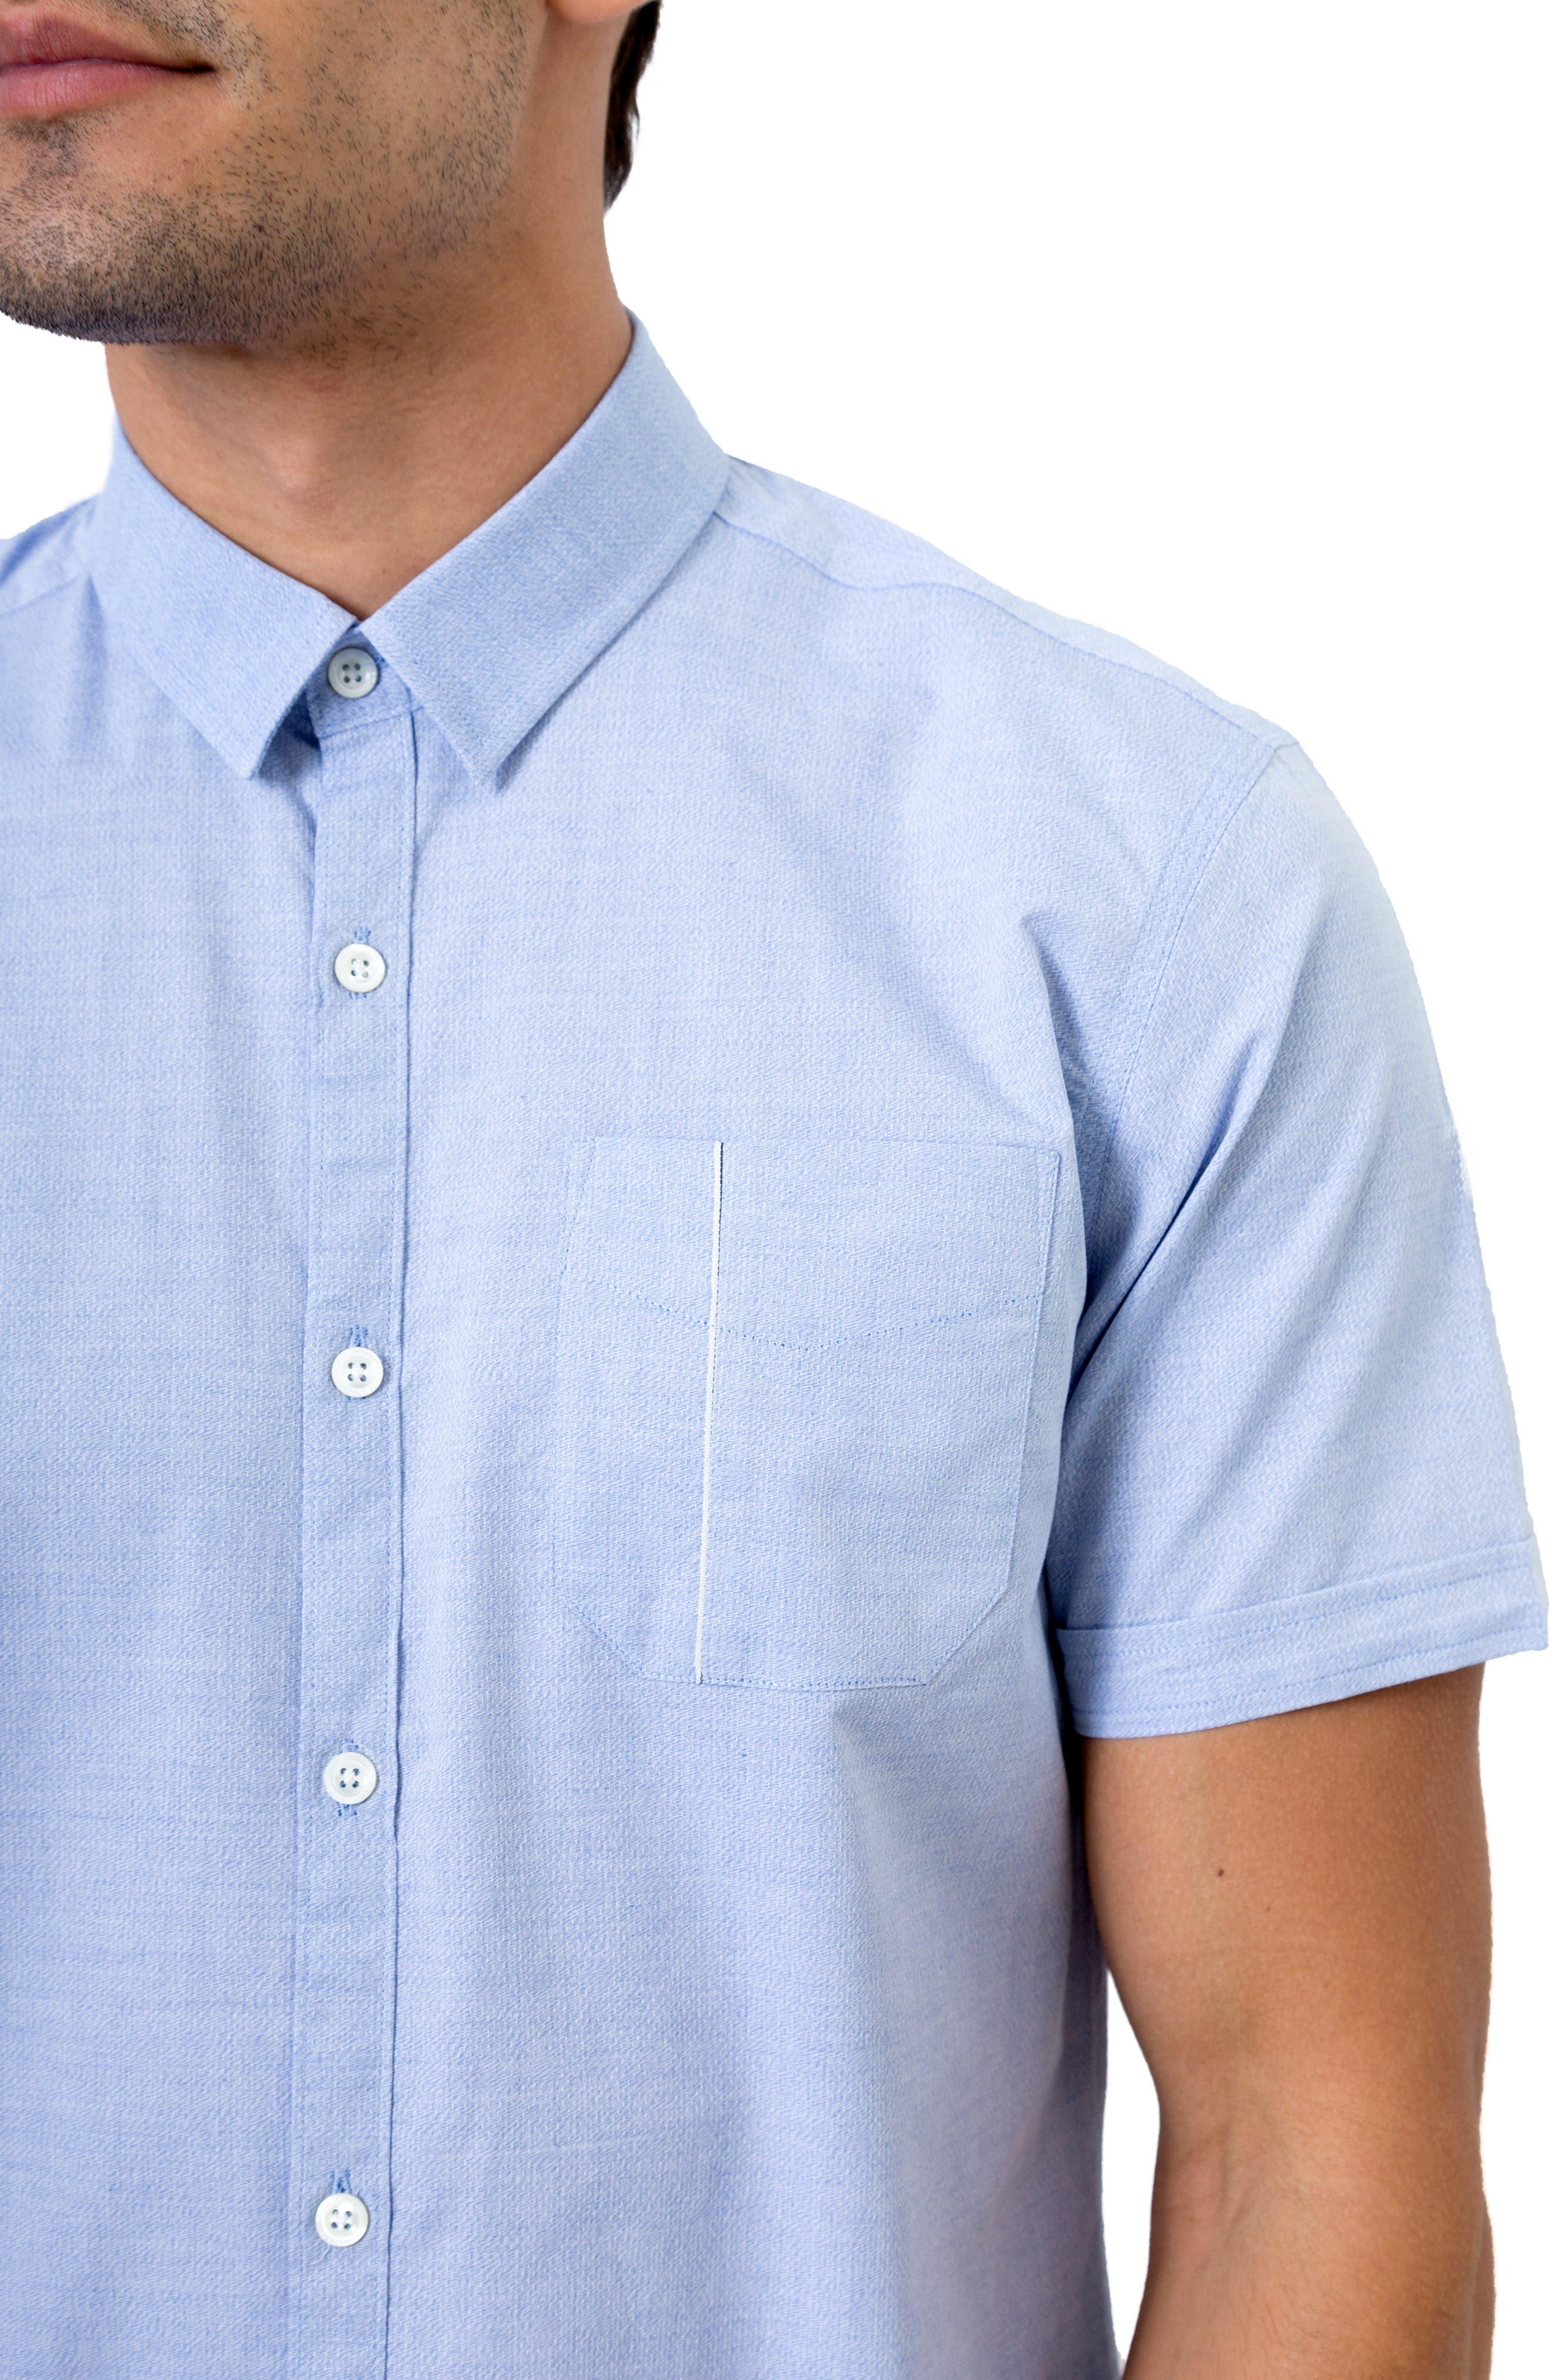 Smile Away Trim Fit Sport Shirt,                             Alternate thumbnail 2, color,                             LIGHT BLUE